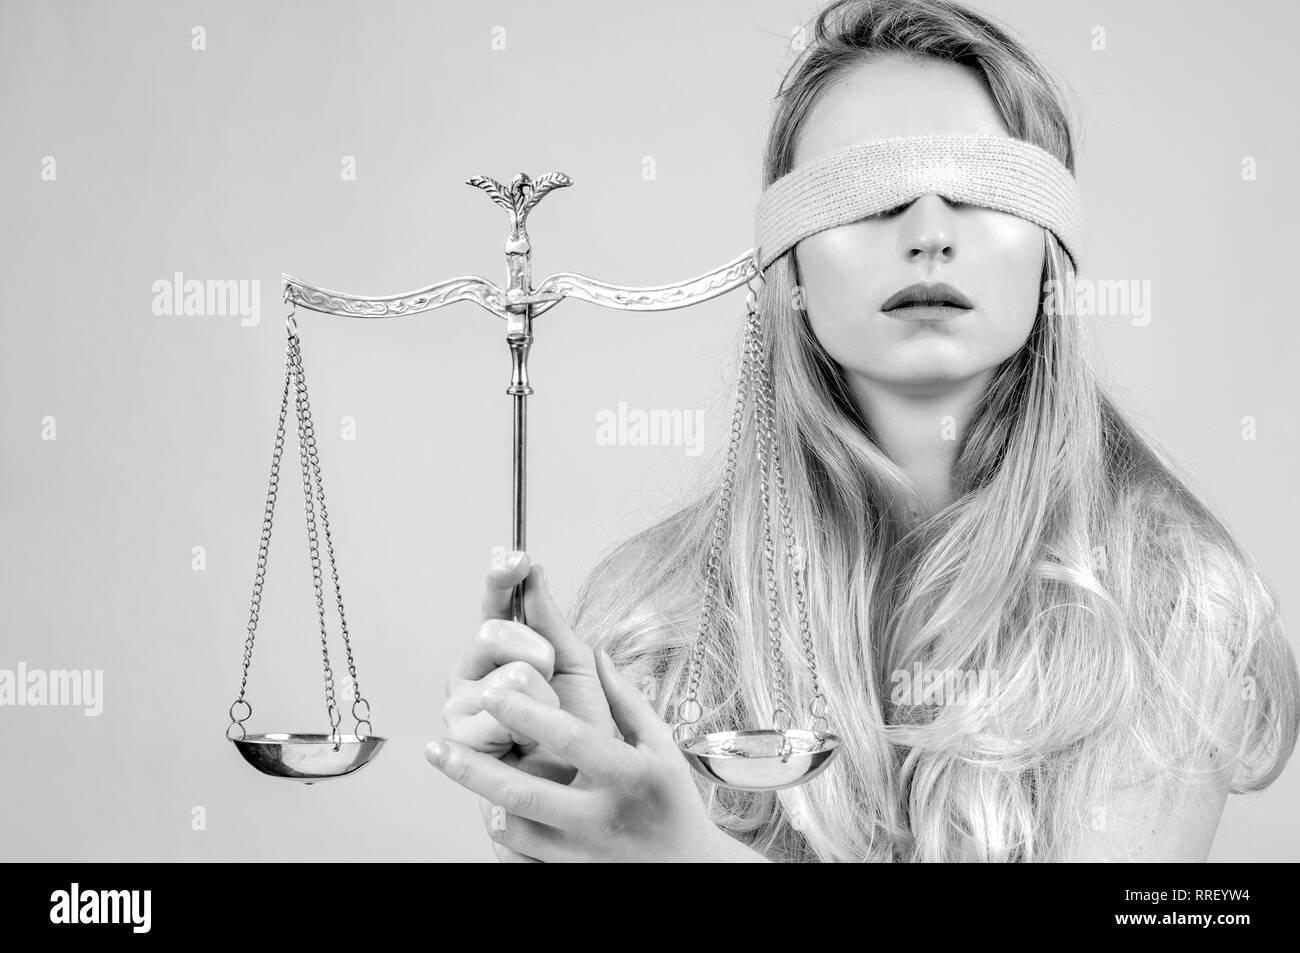 Femida, Goddess of Justice with scales wearing blindfold - Stock Image